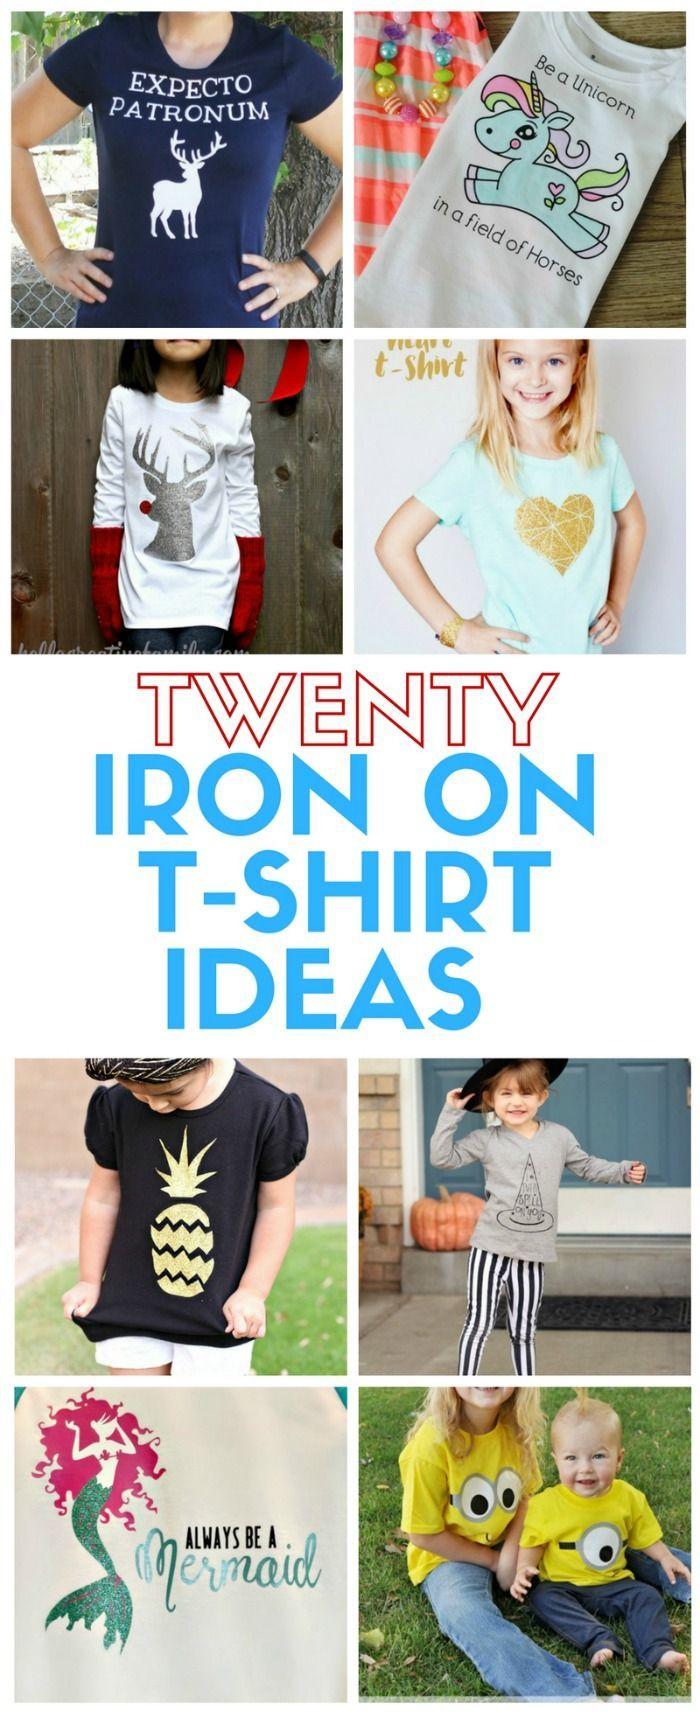 20 T Shirt Ideas Using Heat Transfer Vinyl The Crafty Blog Stalker Vinyl Tshirts Heat Transfer Vinyl Easy Diy Crafts